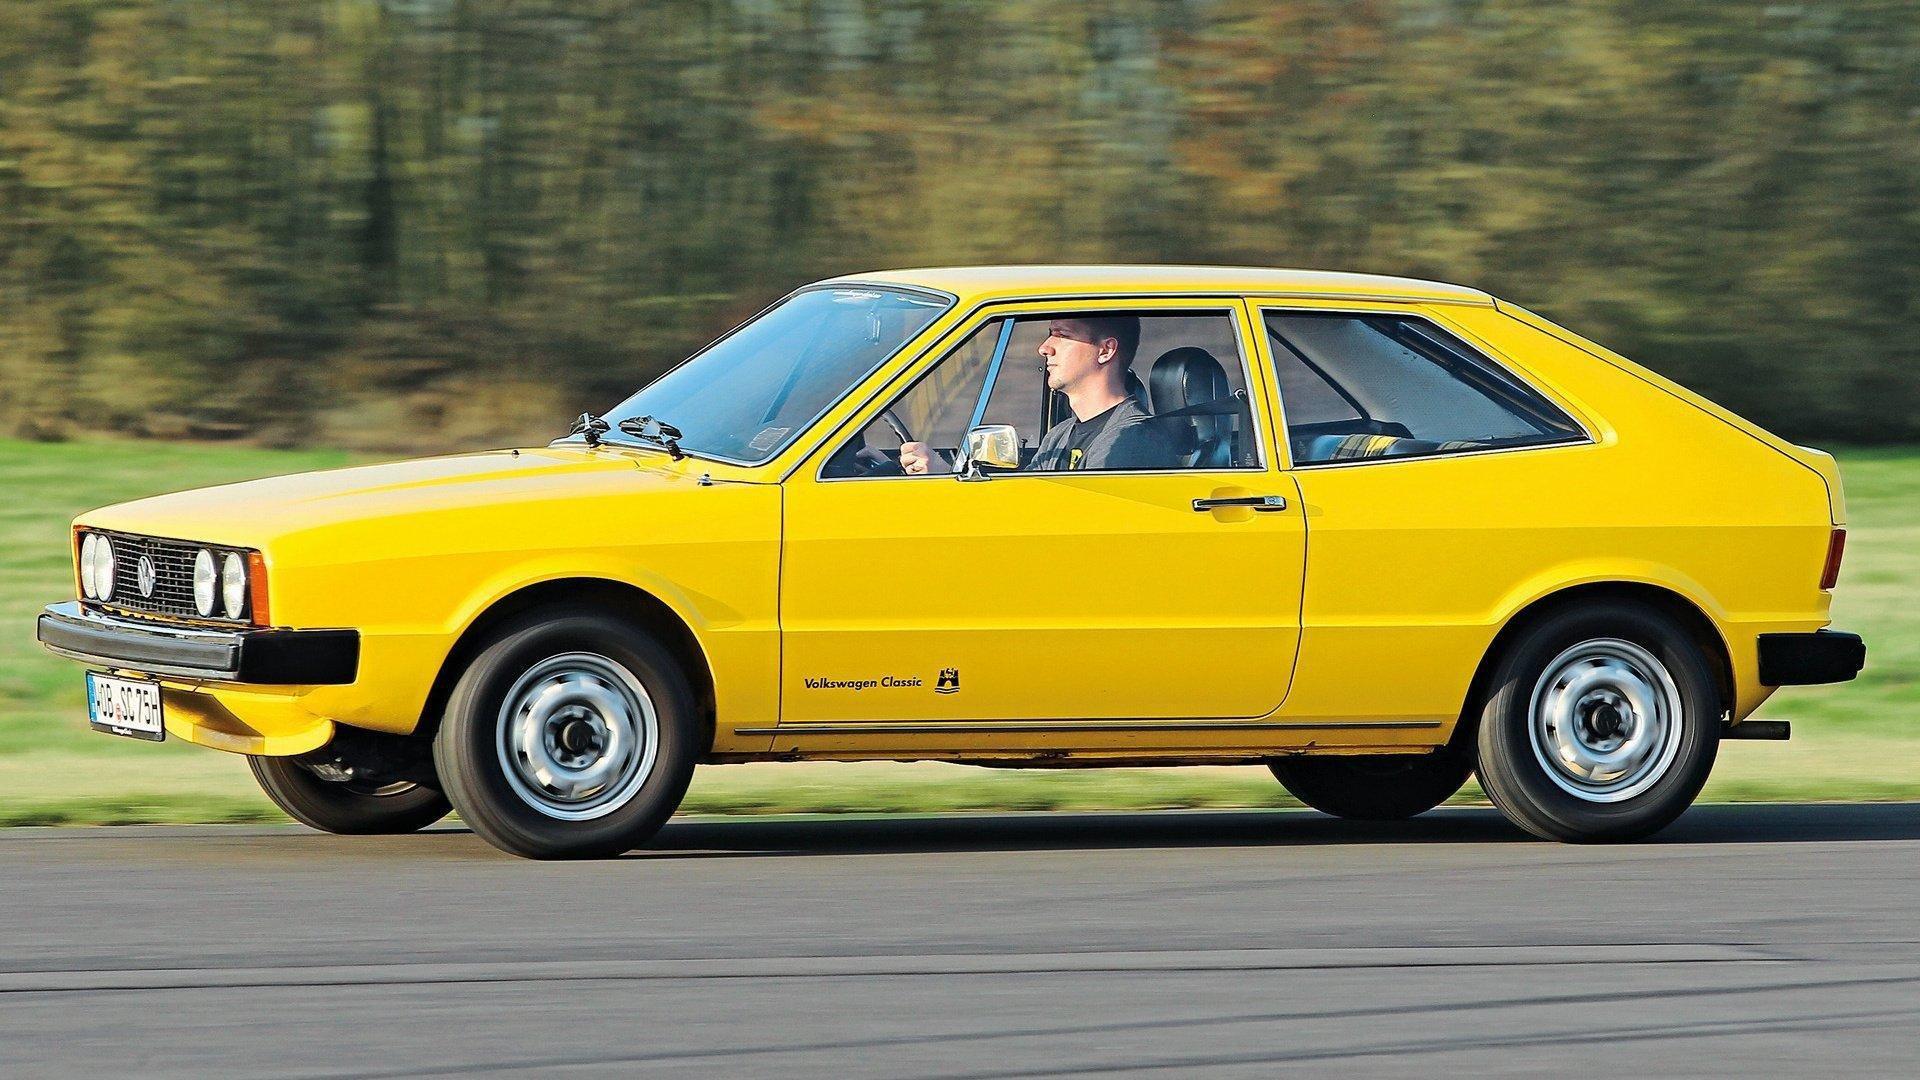 Volkswagen Scirocco I foto - Volkswagen Scirocco III karşılaştırma